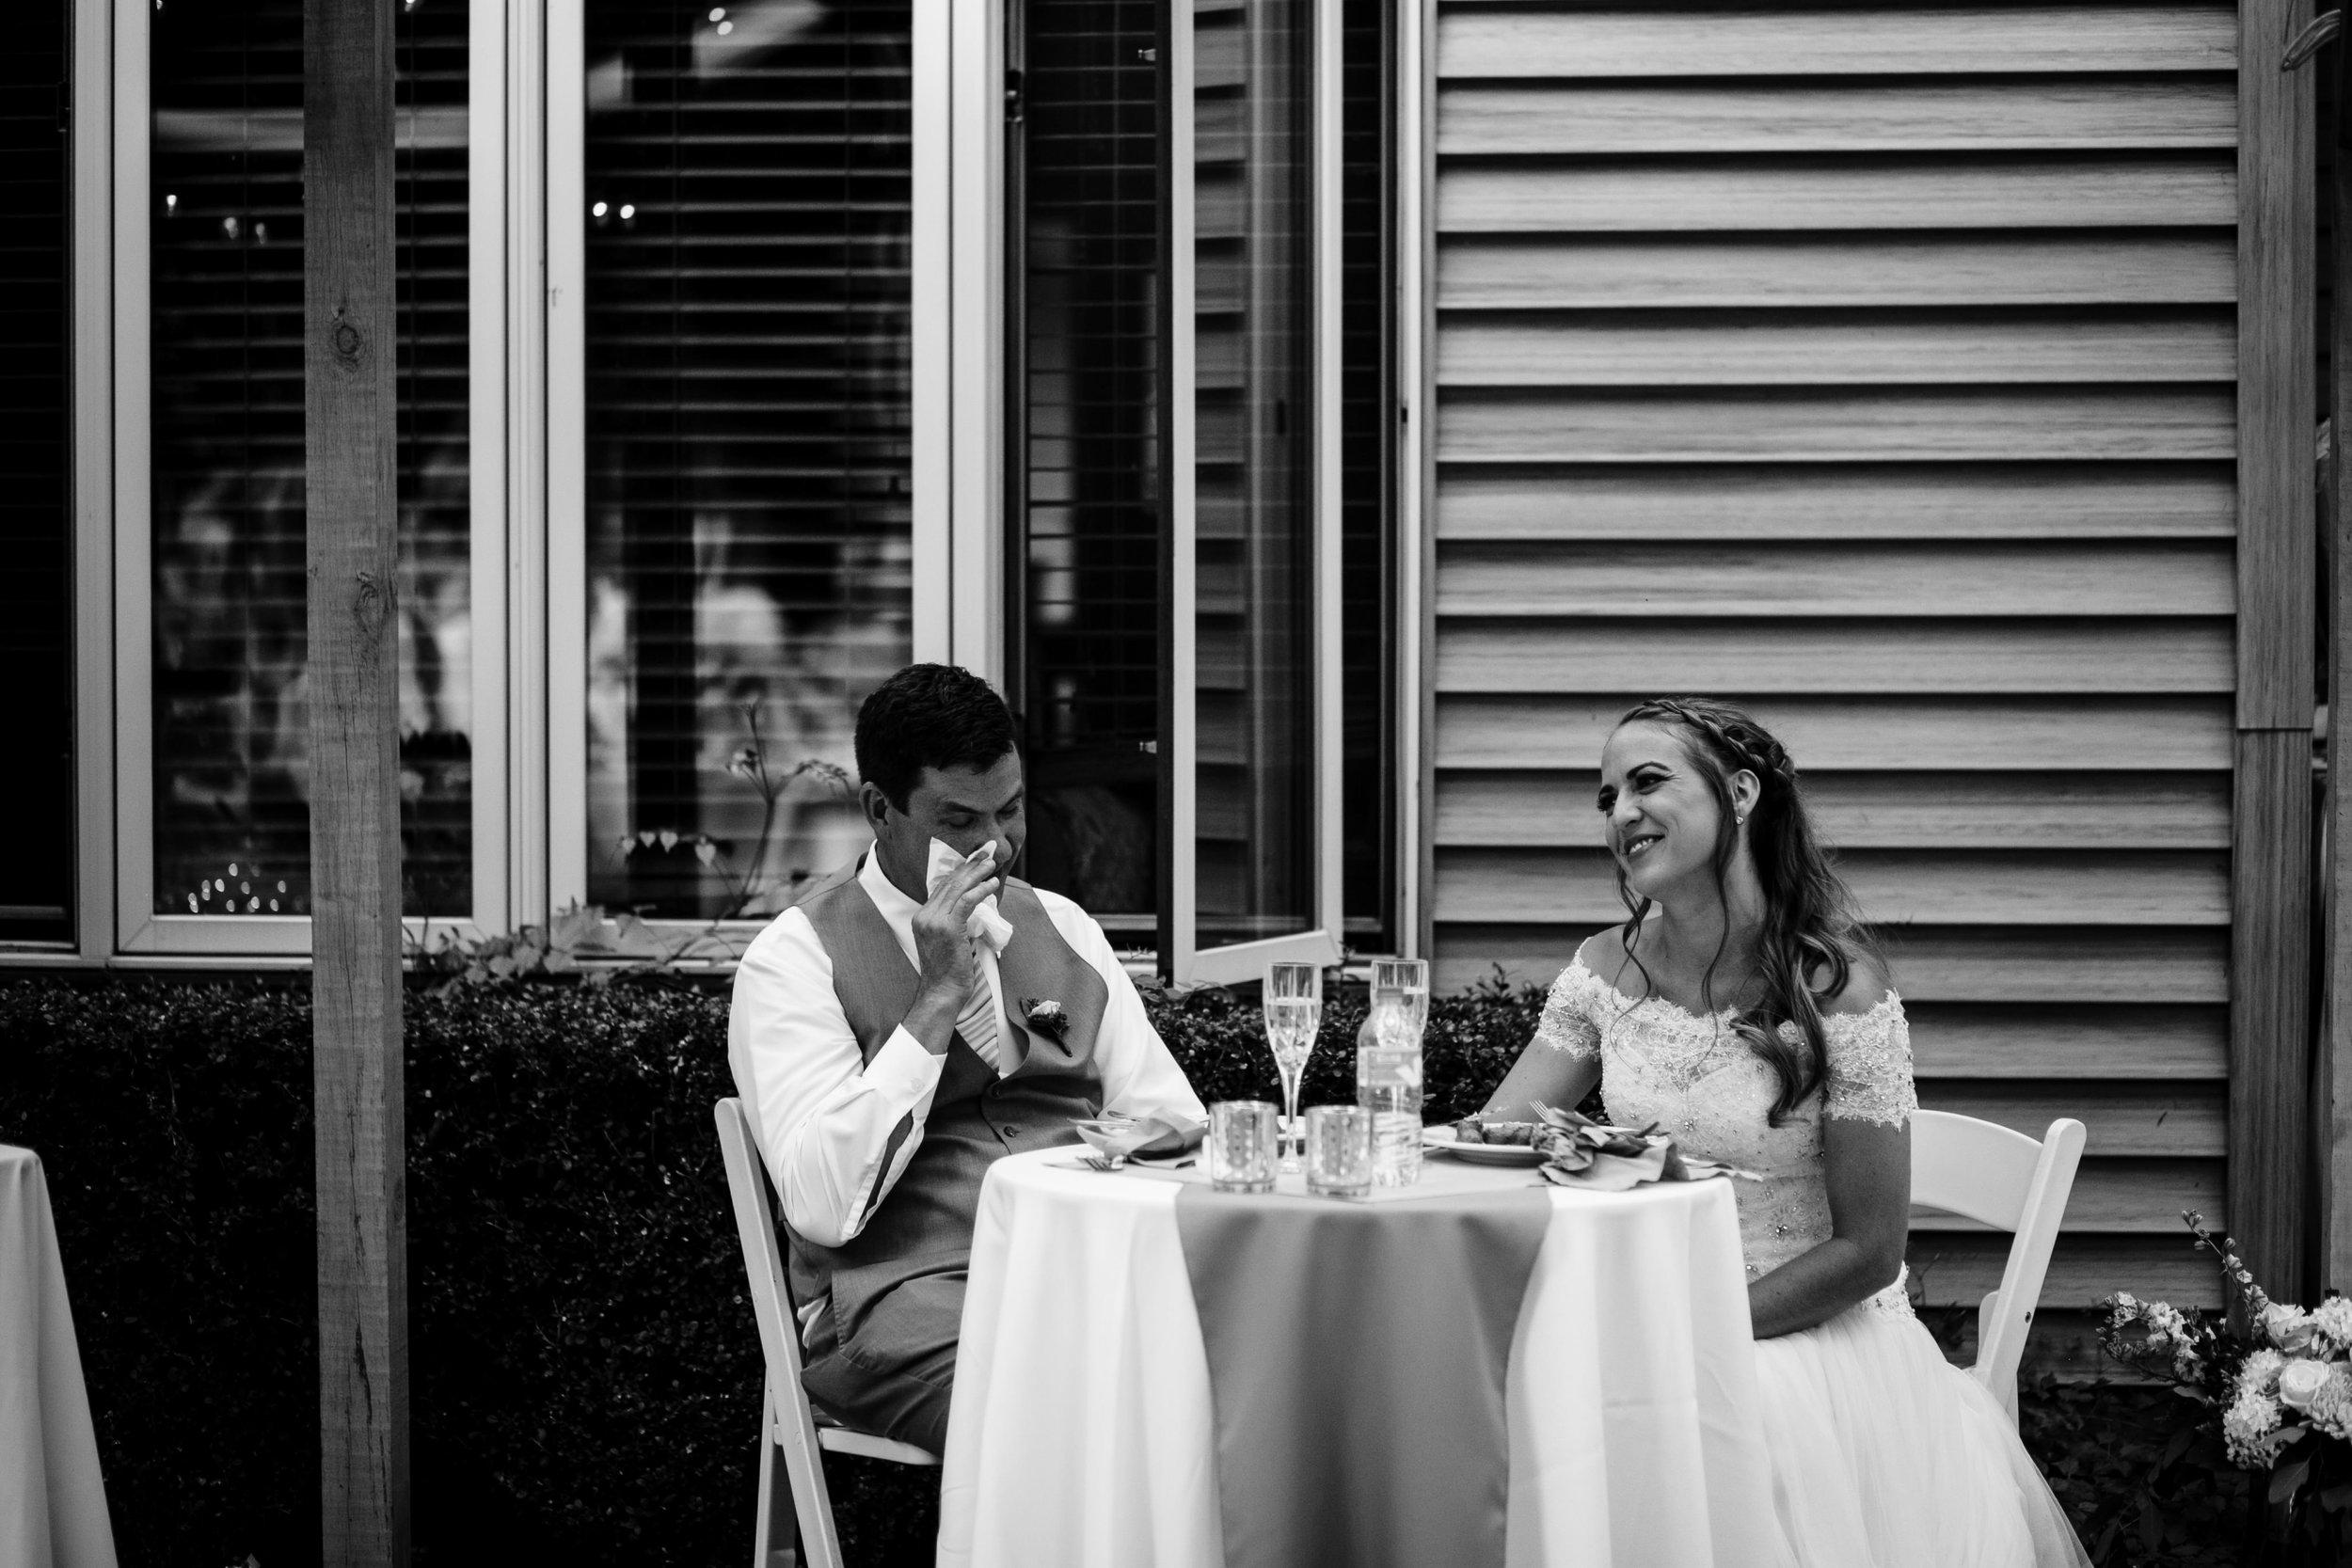 ludington-michigan-intimate-backyard-wedding-jessica-nolan421.jpg